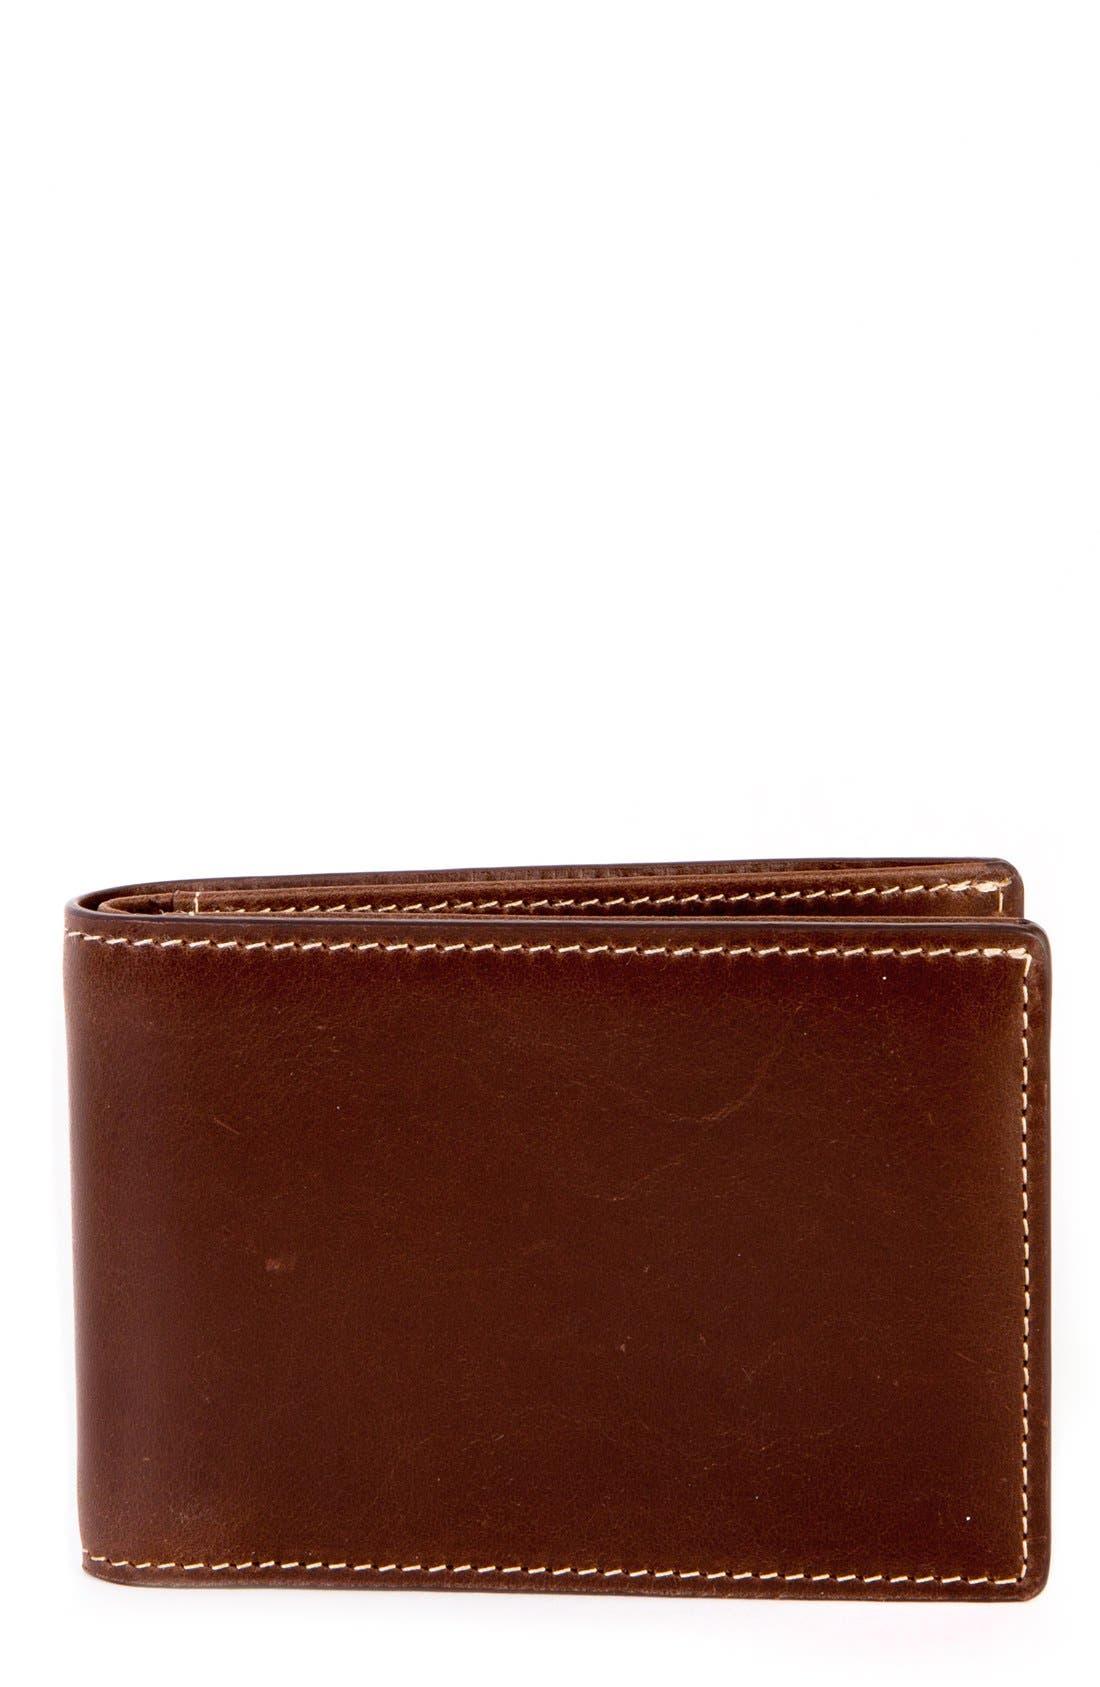 BOCONI Bryant Leather RFID Wallet